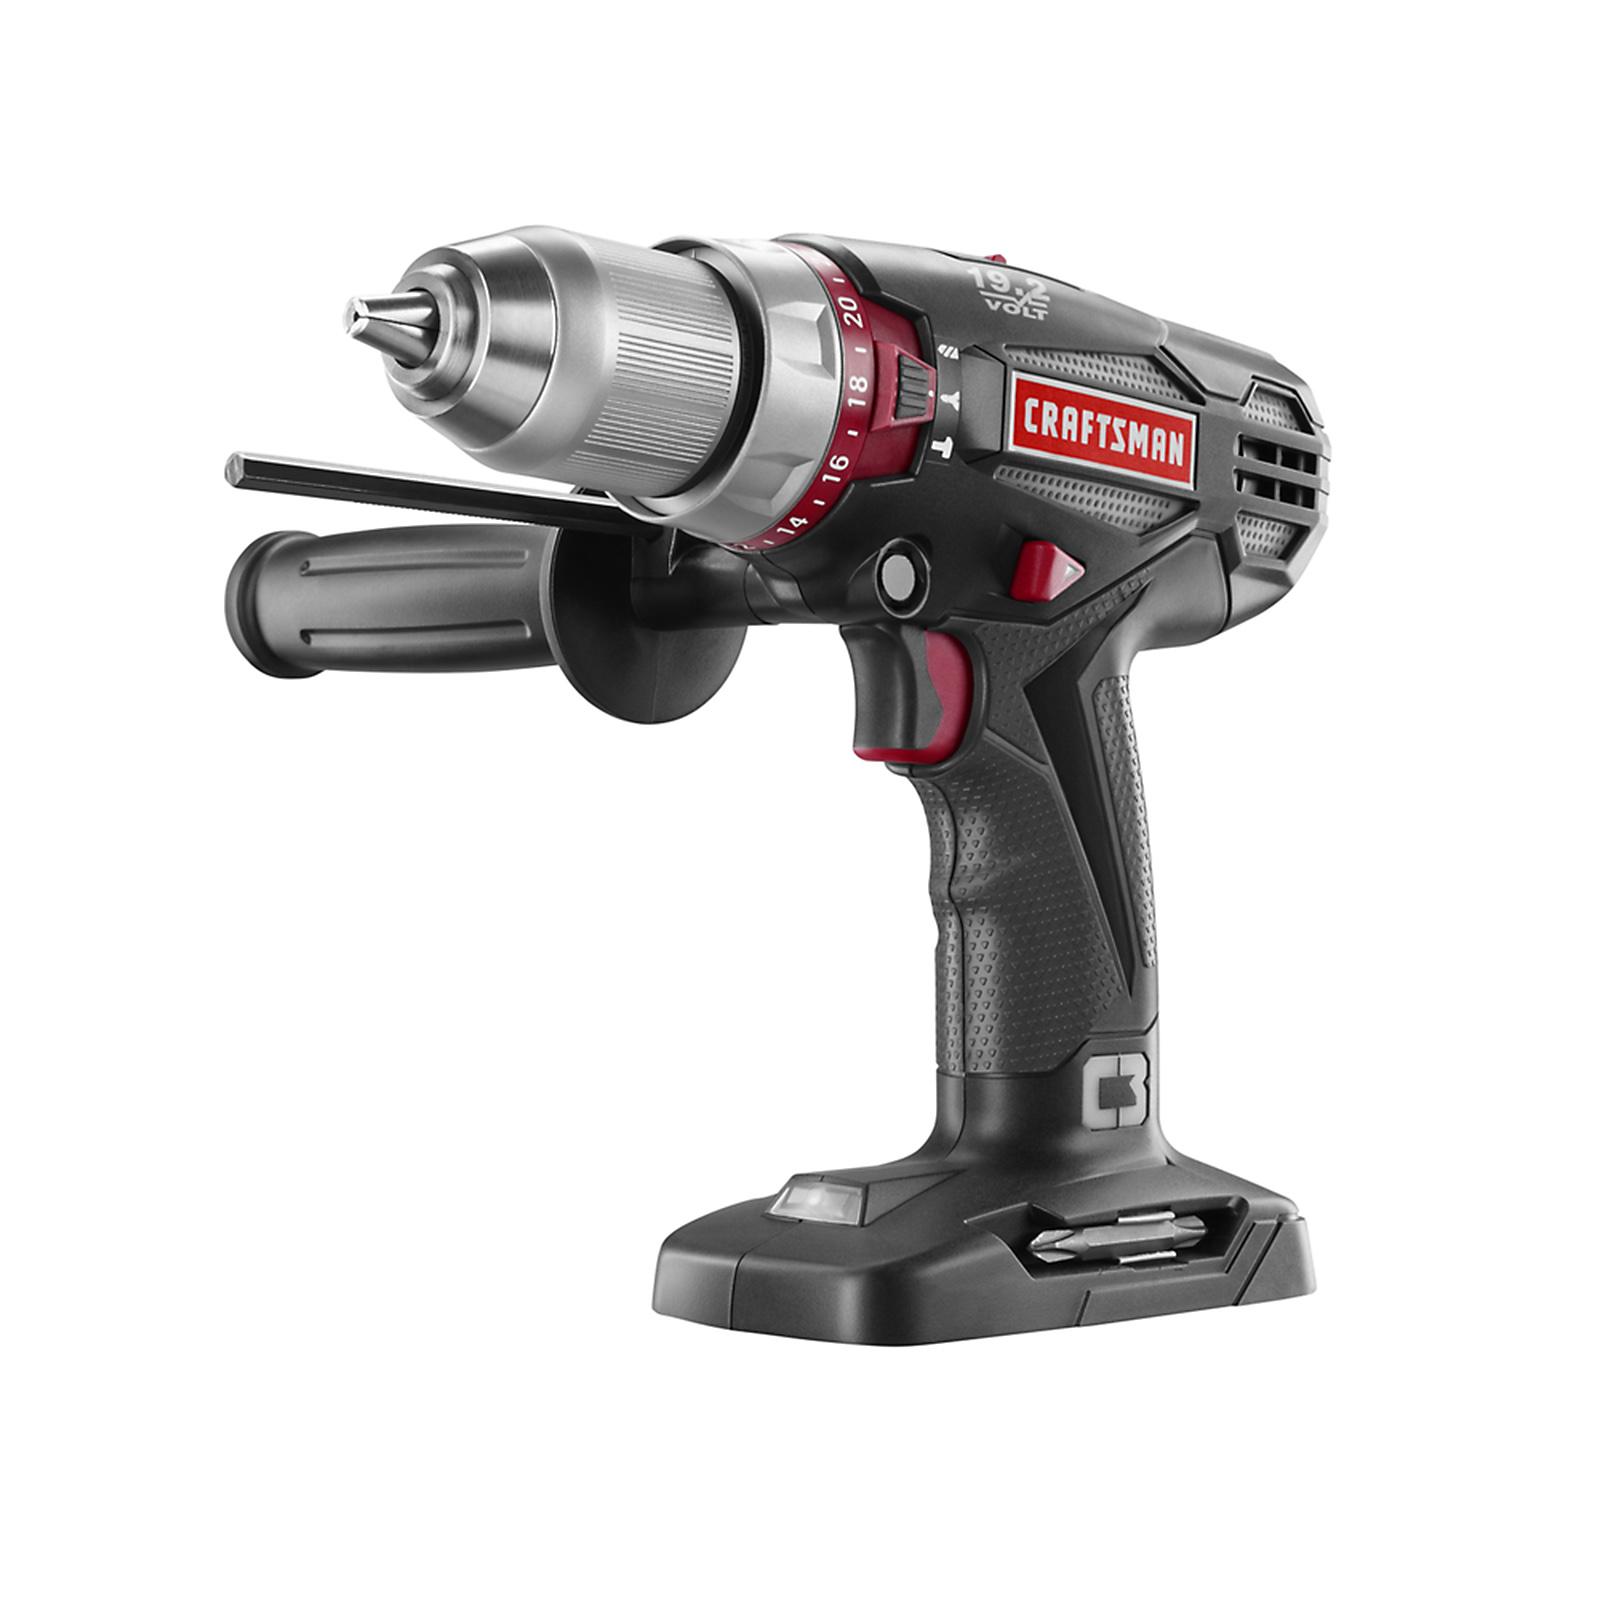 craftsman c3 hammer drill add on tool rh kmart com Craftsman Snow Blower Parts Manuals Craftsman Repair Manual